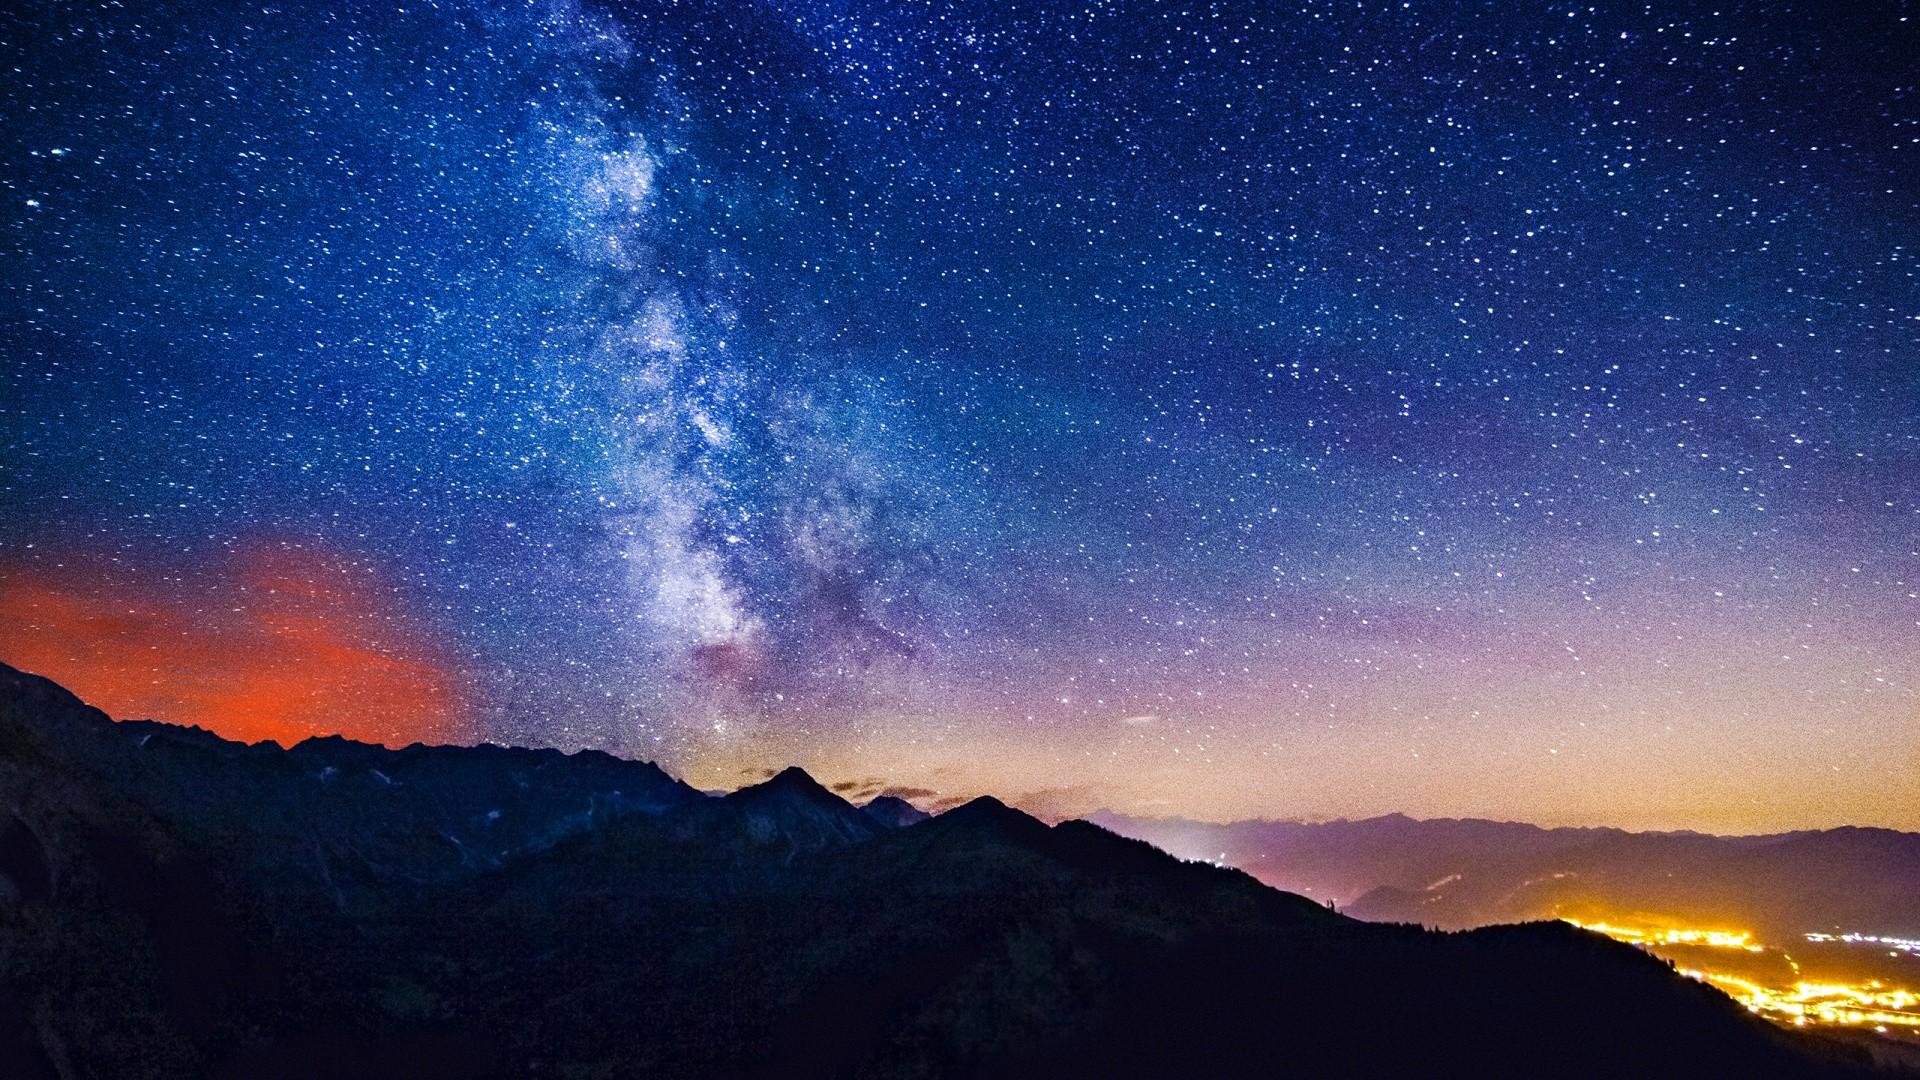 Milky Way Wallpaper HD 28616